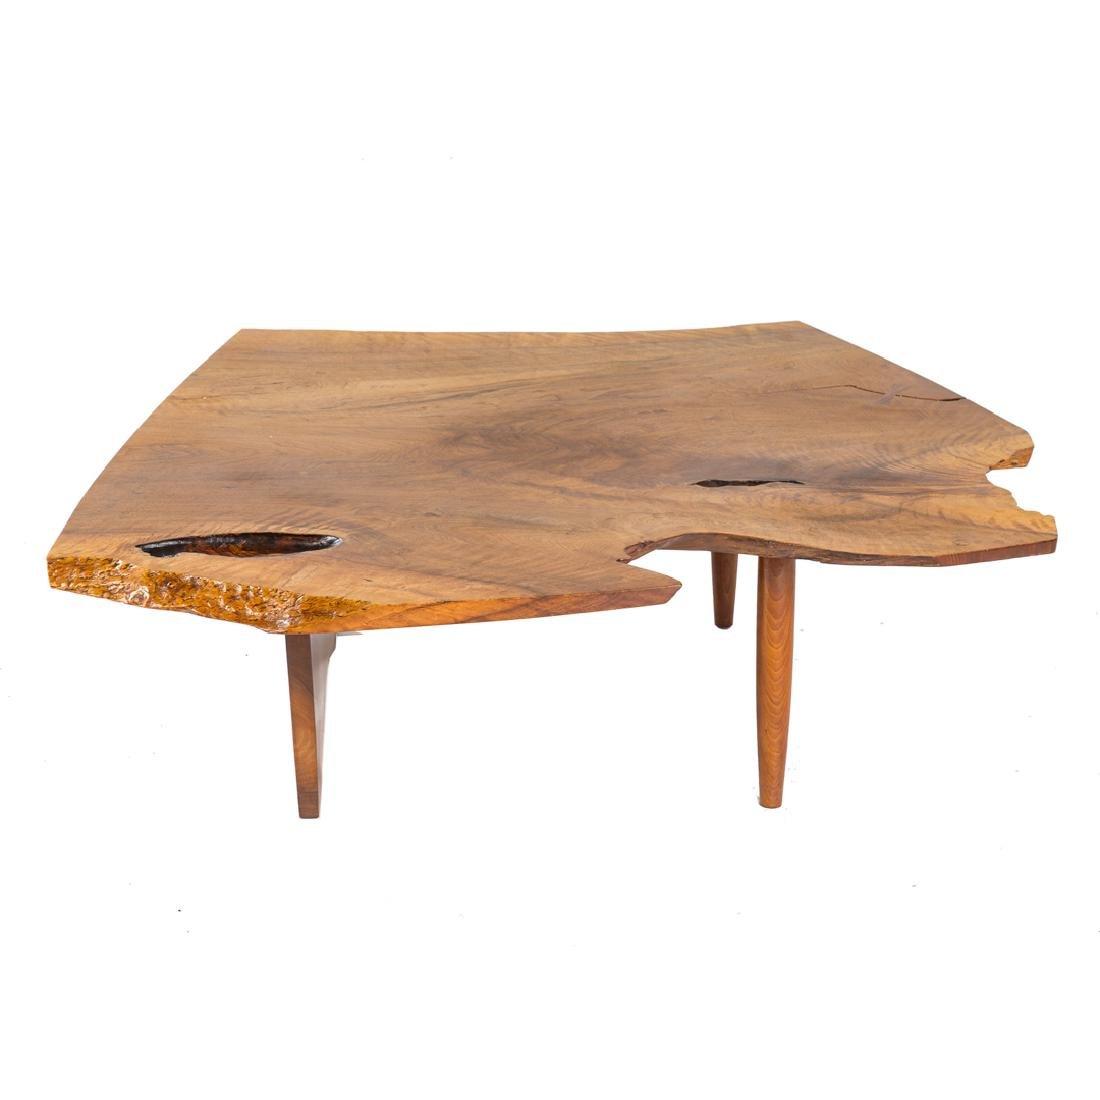 George Nakashima Conoid Coffee Table - 4